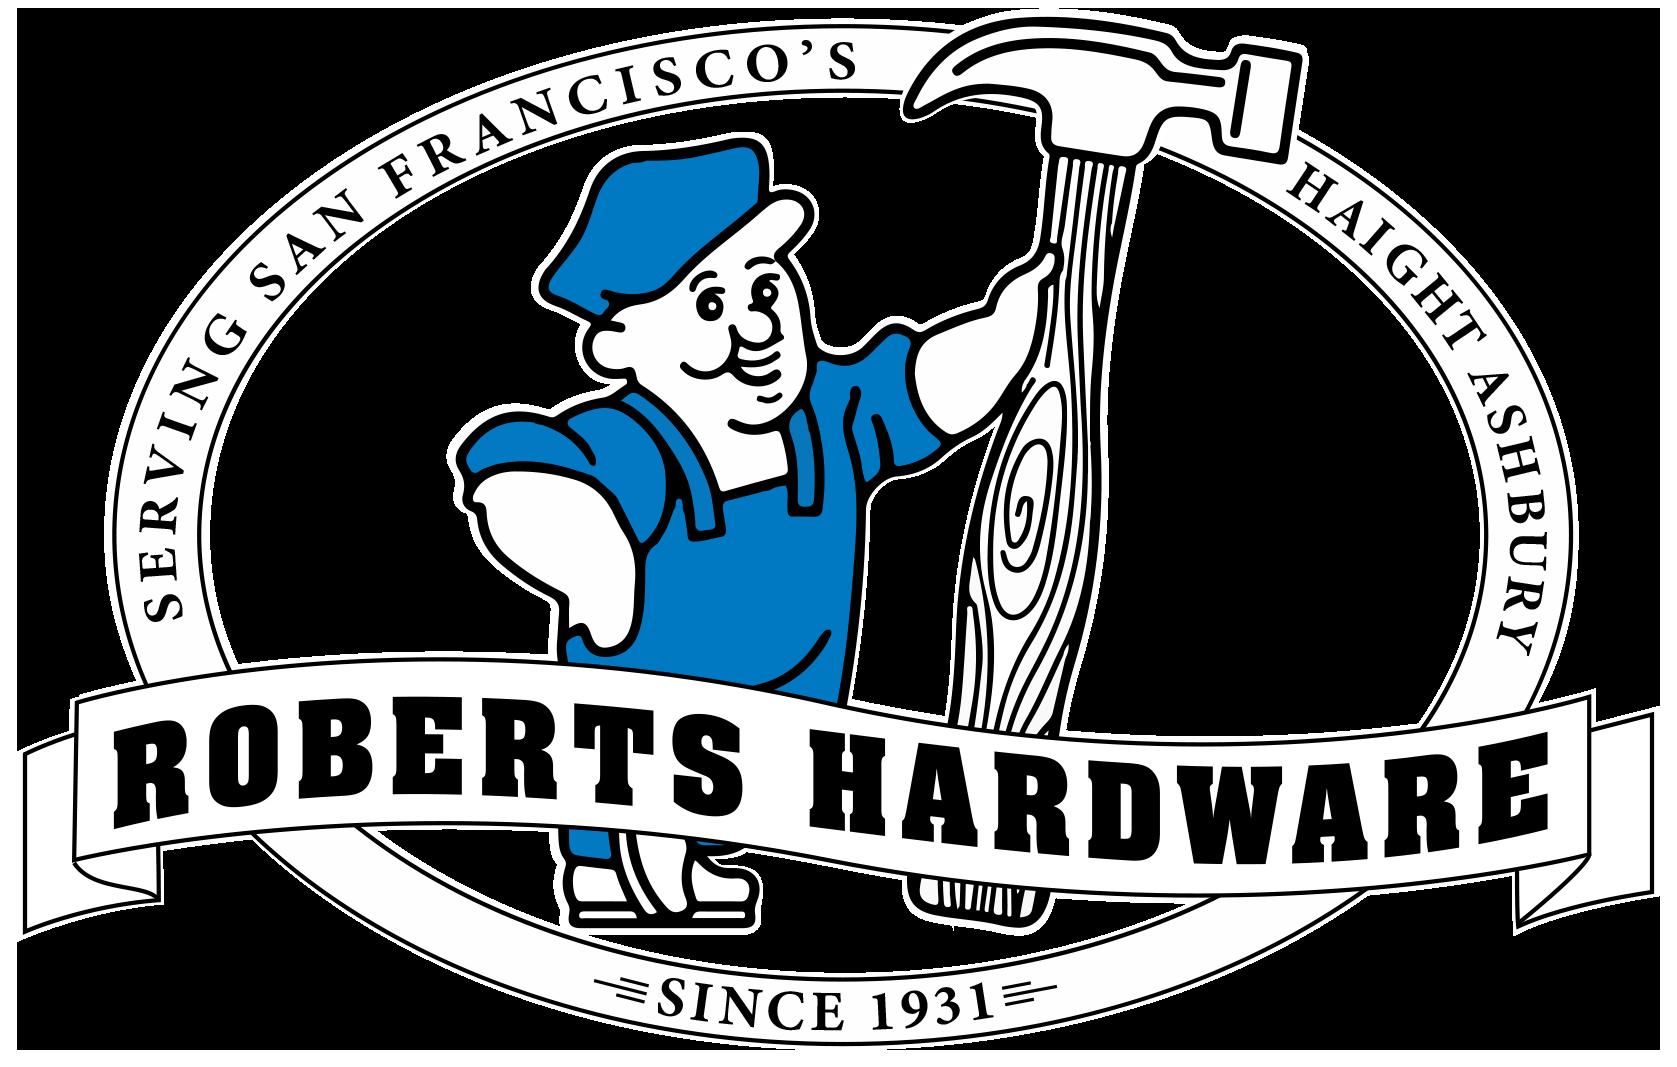 Roberts Hardware